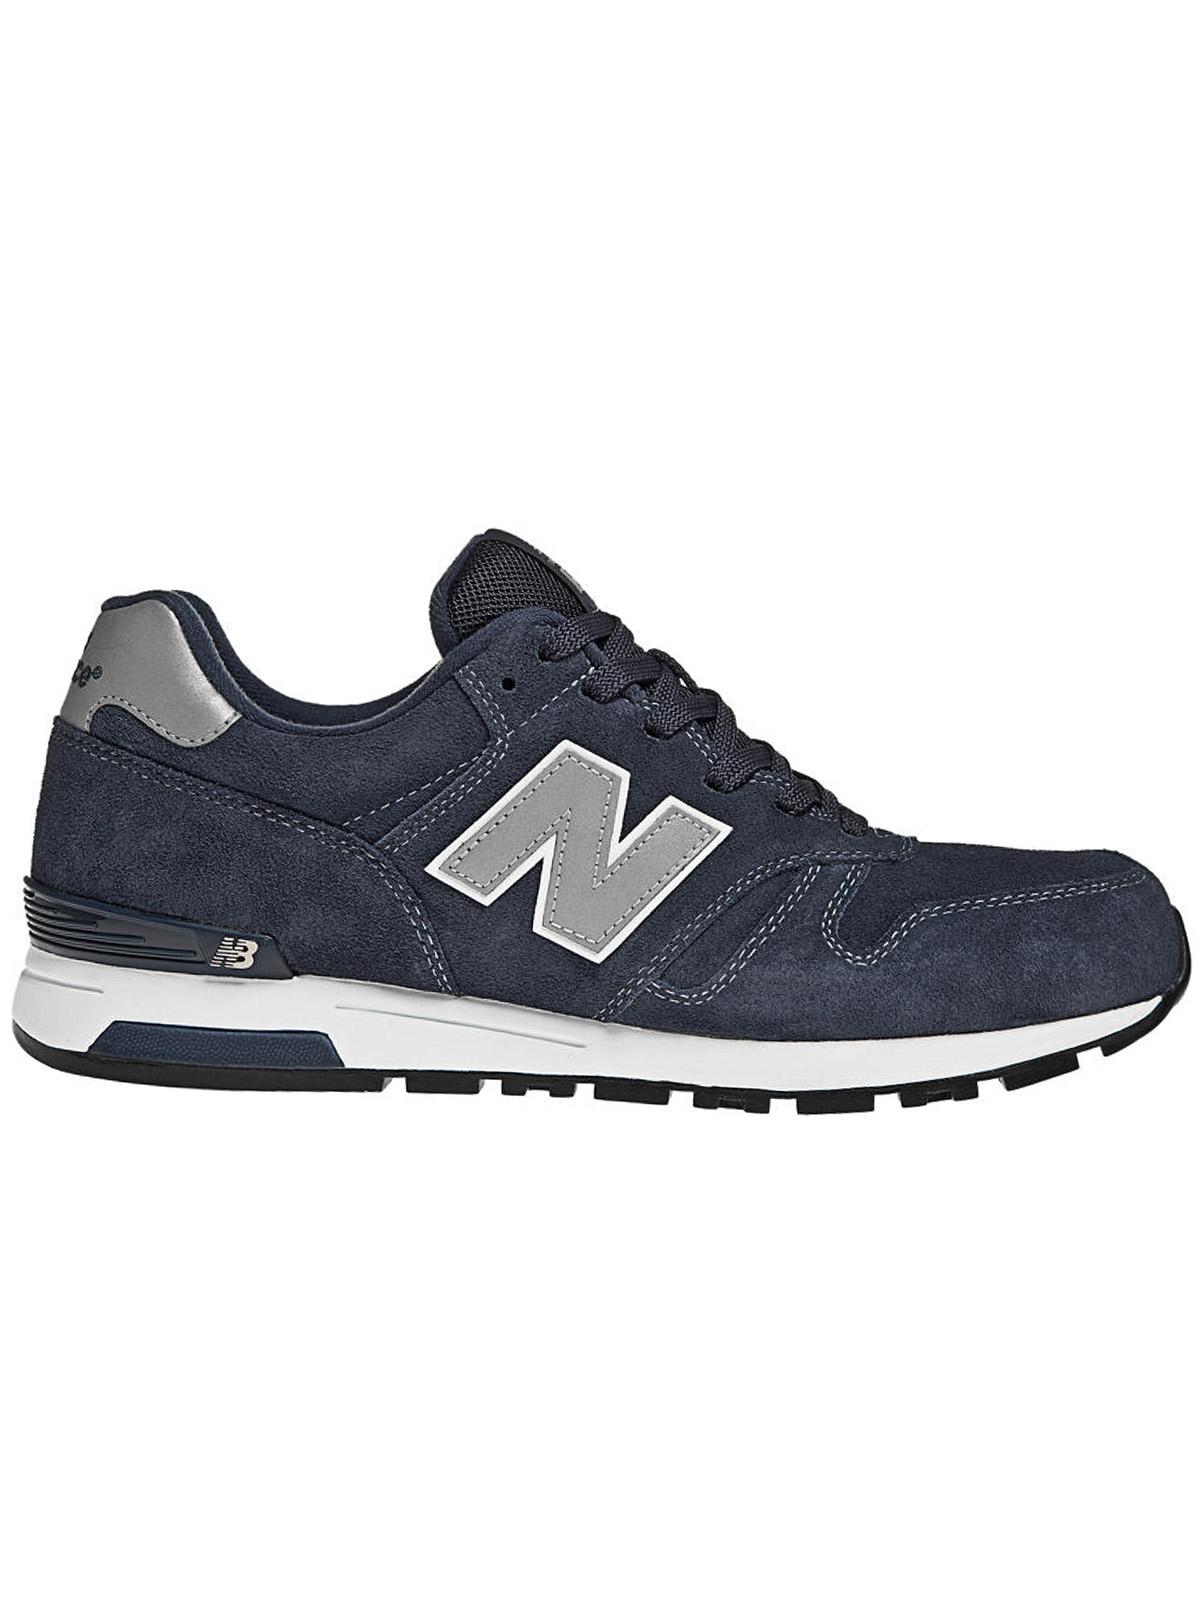 New Balance 565 NEW BALANCE   12   ML565NV